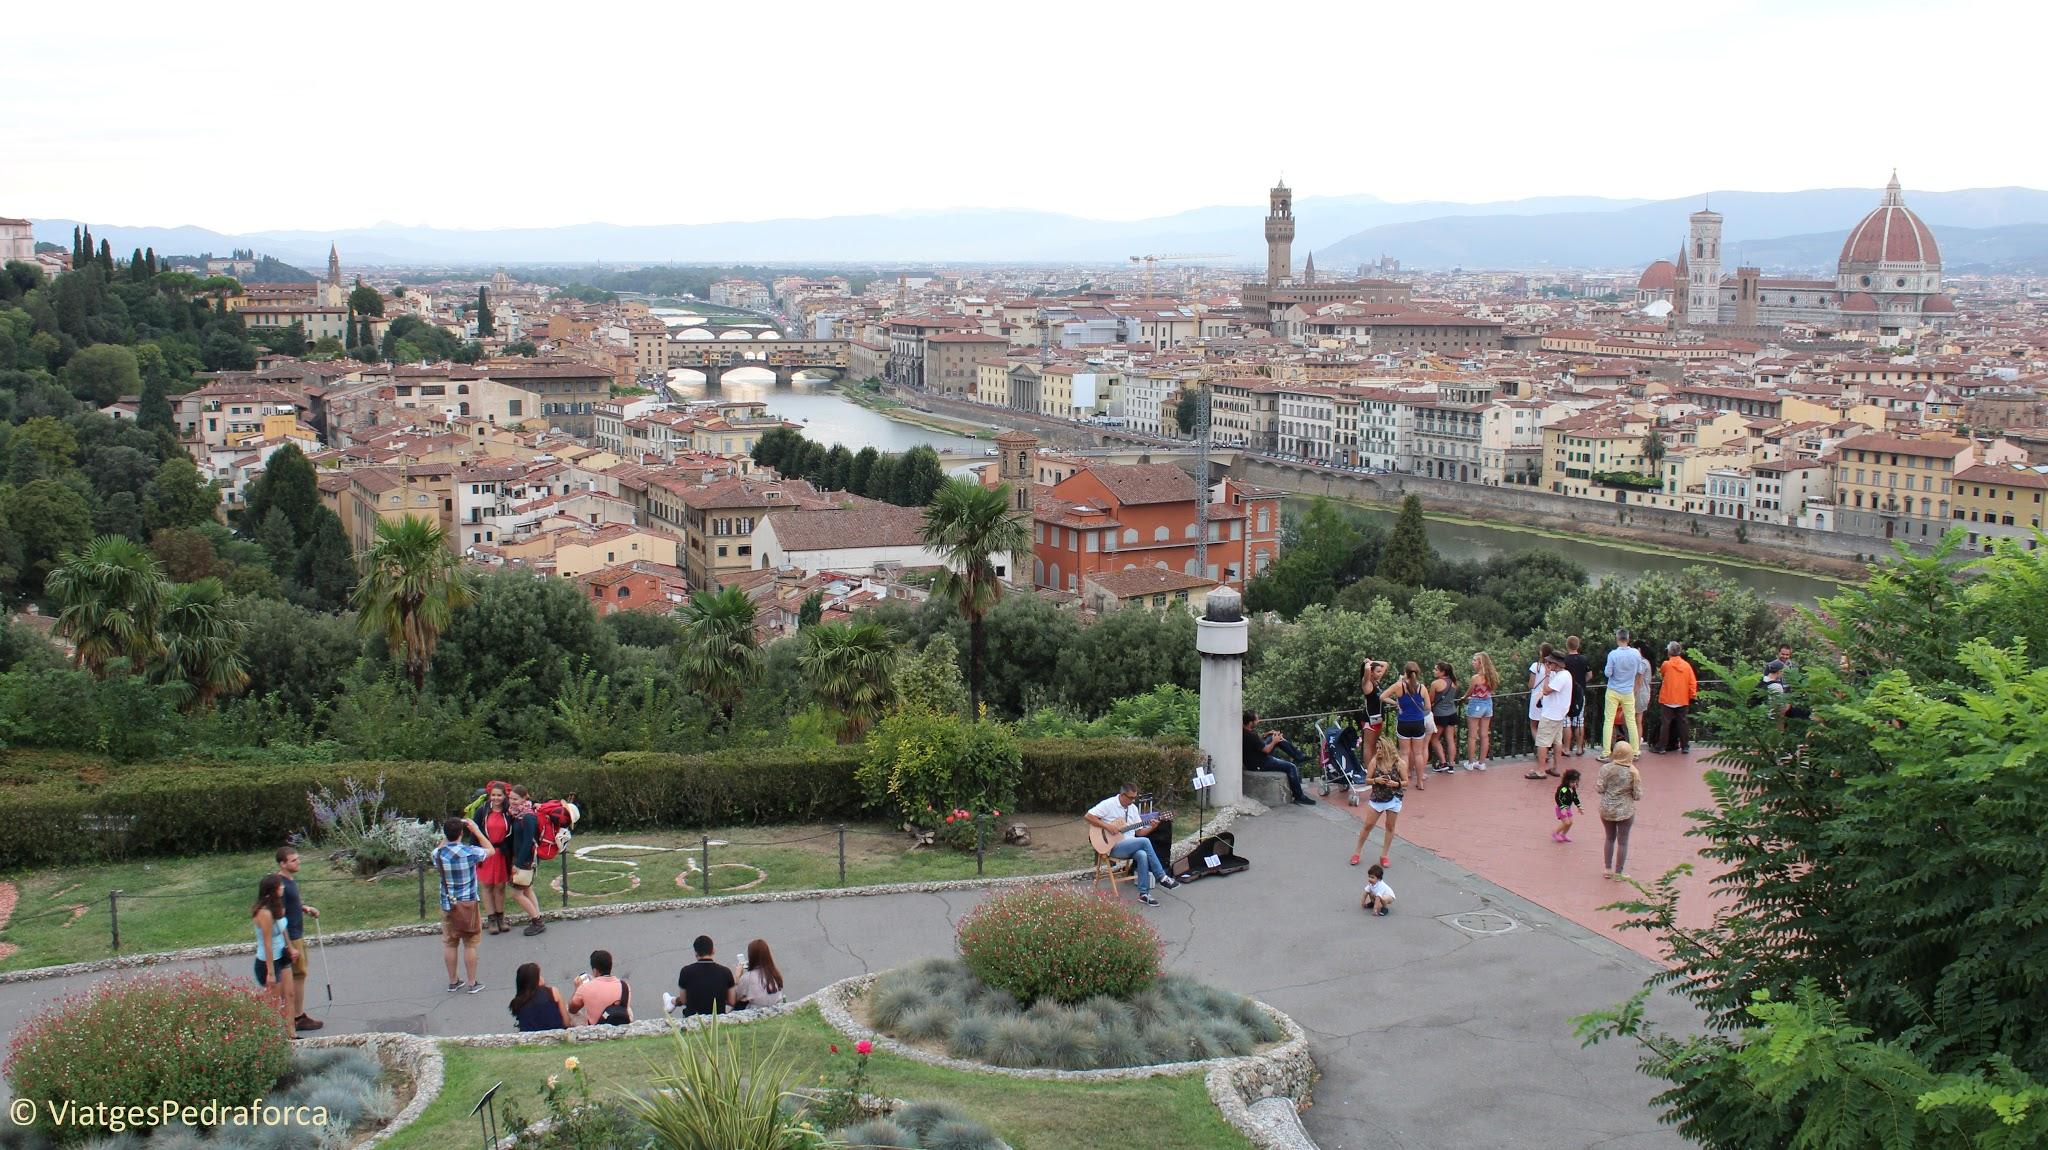 Firenze, Oltrarno, Centre Històric de Florència, Unesco, Patrimoni de la Humanitat, Toscana, Itàlia